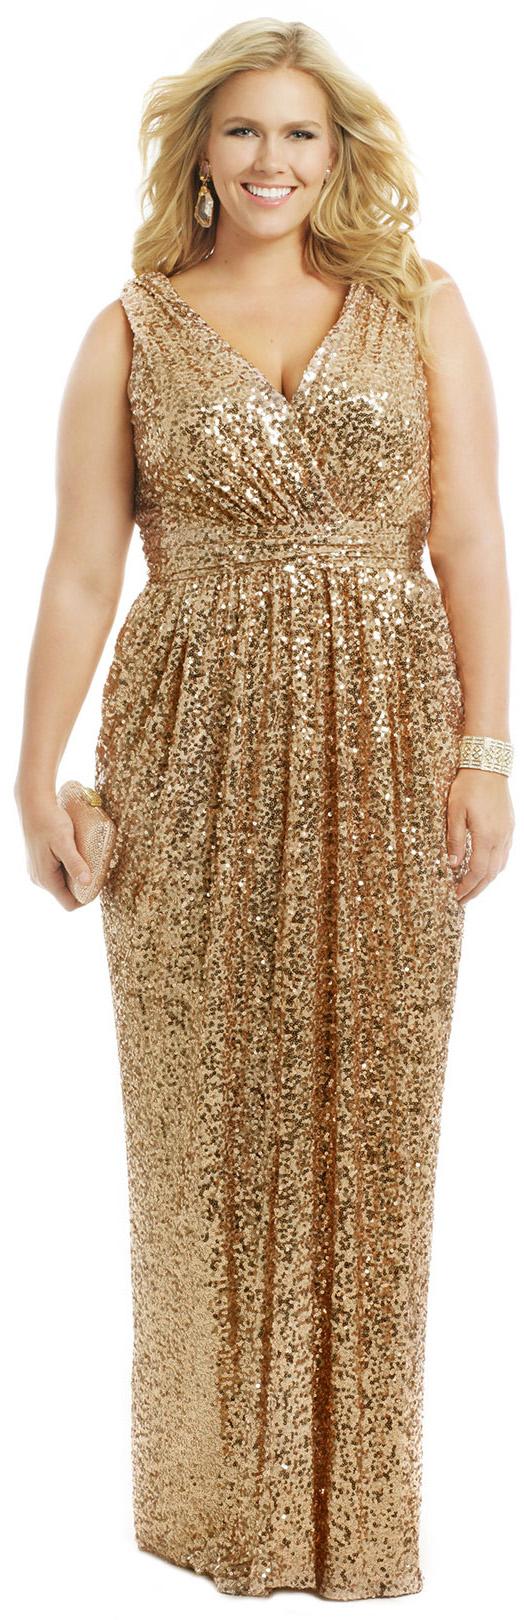 Straps v neck sequin gold long bridesmaid dress plus size formal